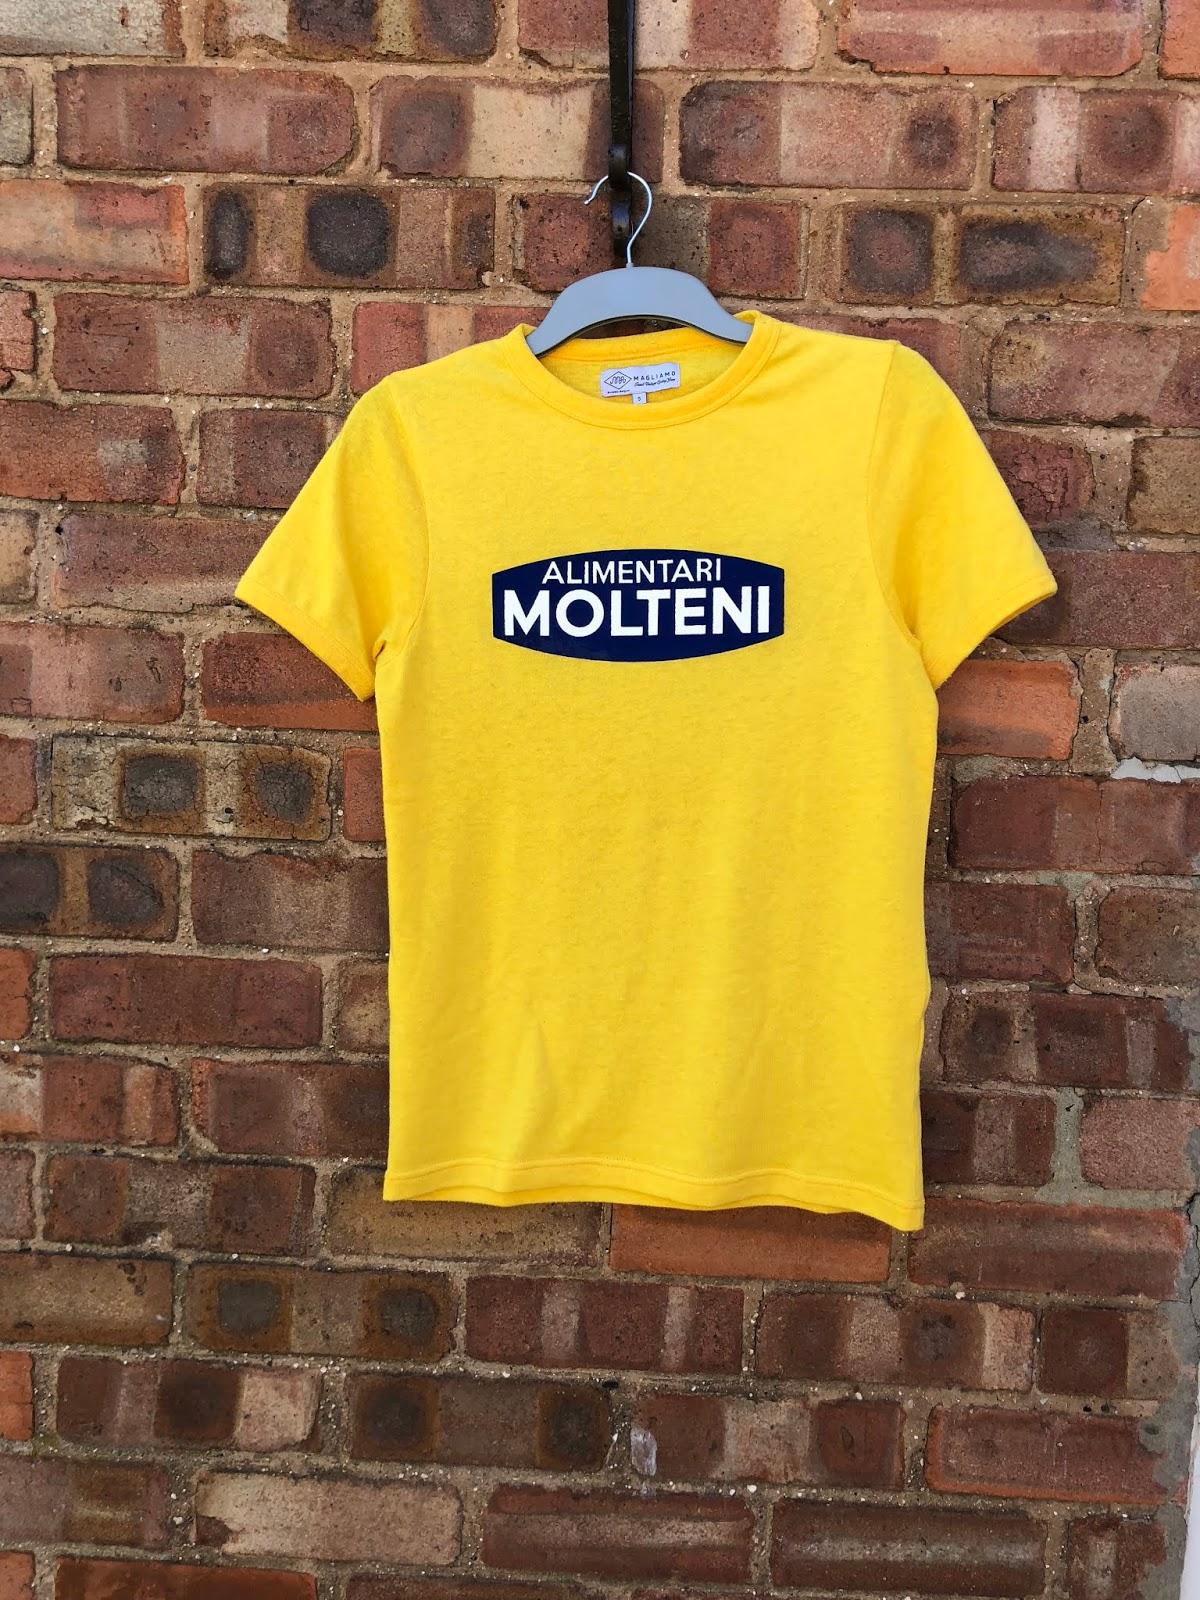 Magliamo Eddy Merckx Molteni Tour de France T-shirt - Move On Up Blog 3cbfc7eac